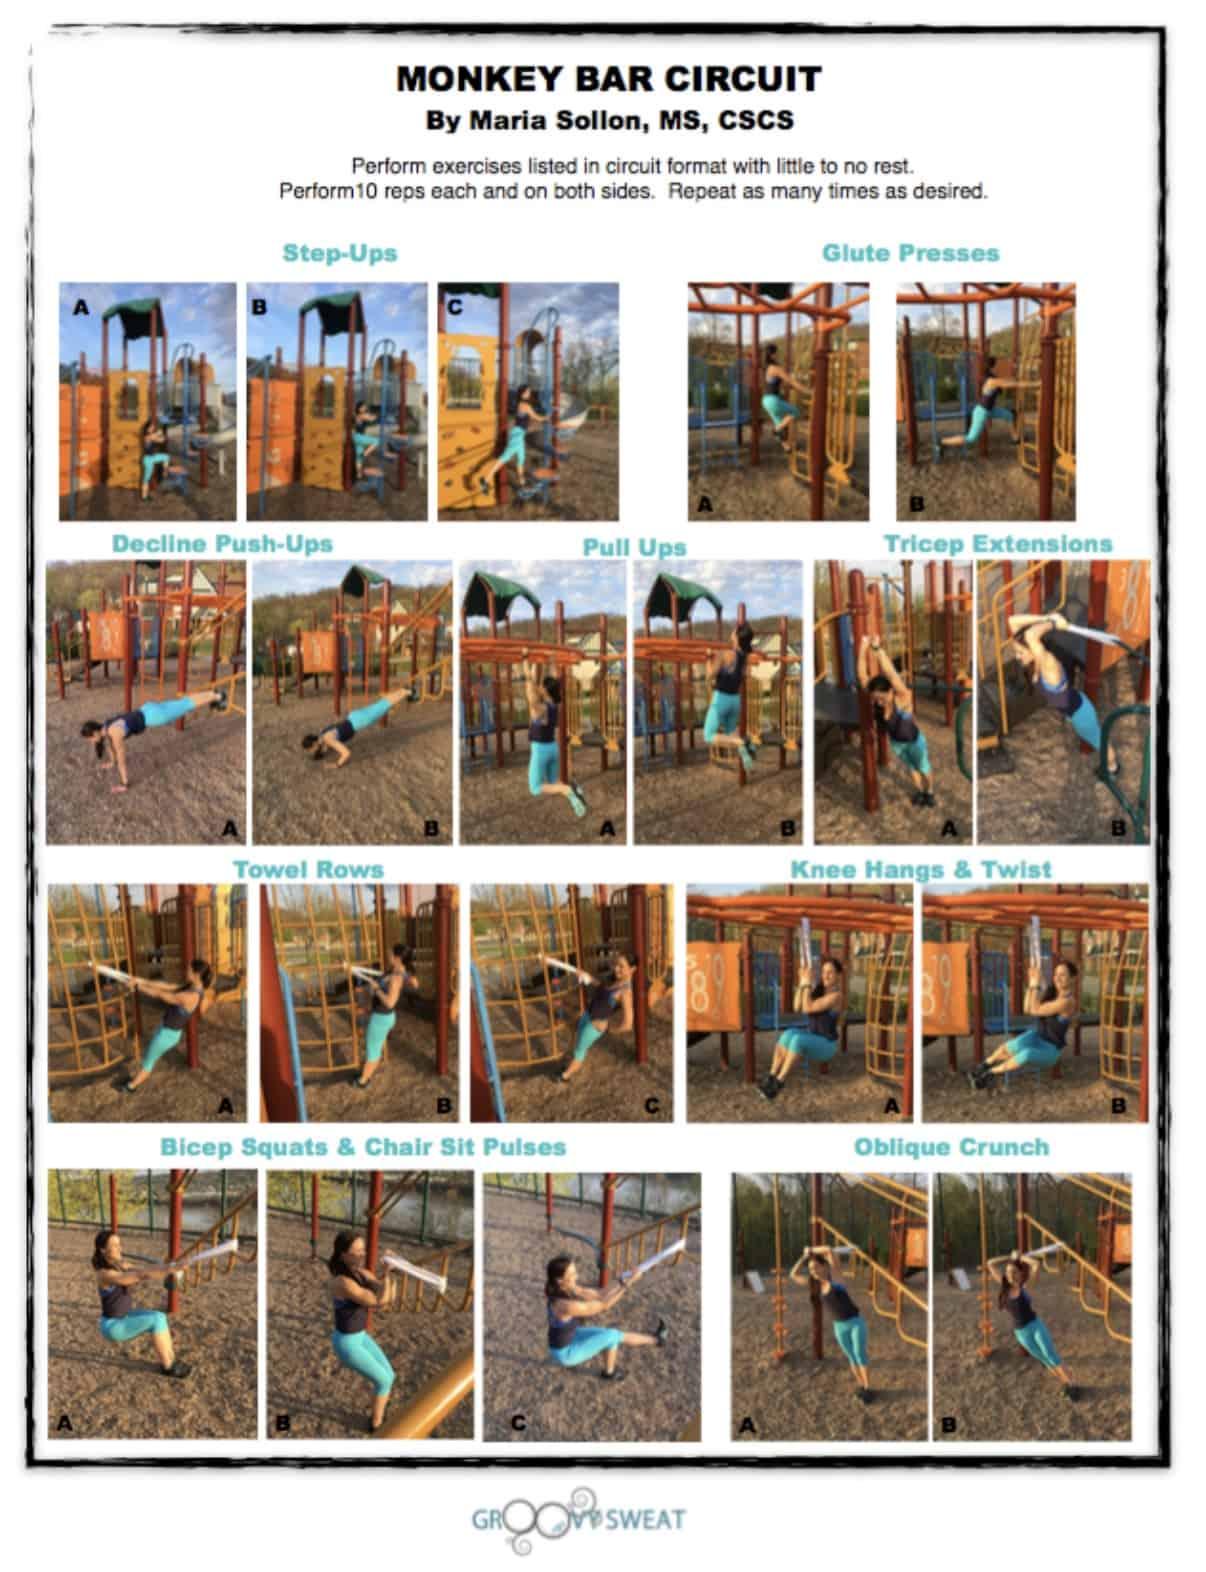 playground-workout-monkey-bars-card